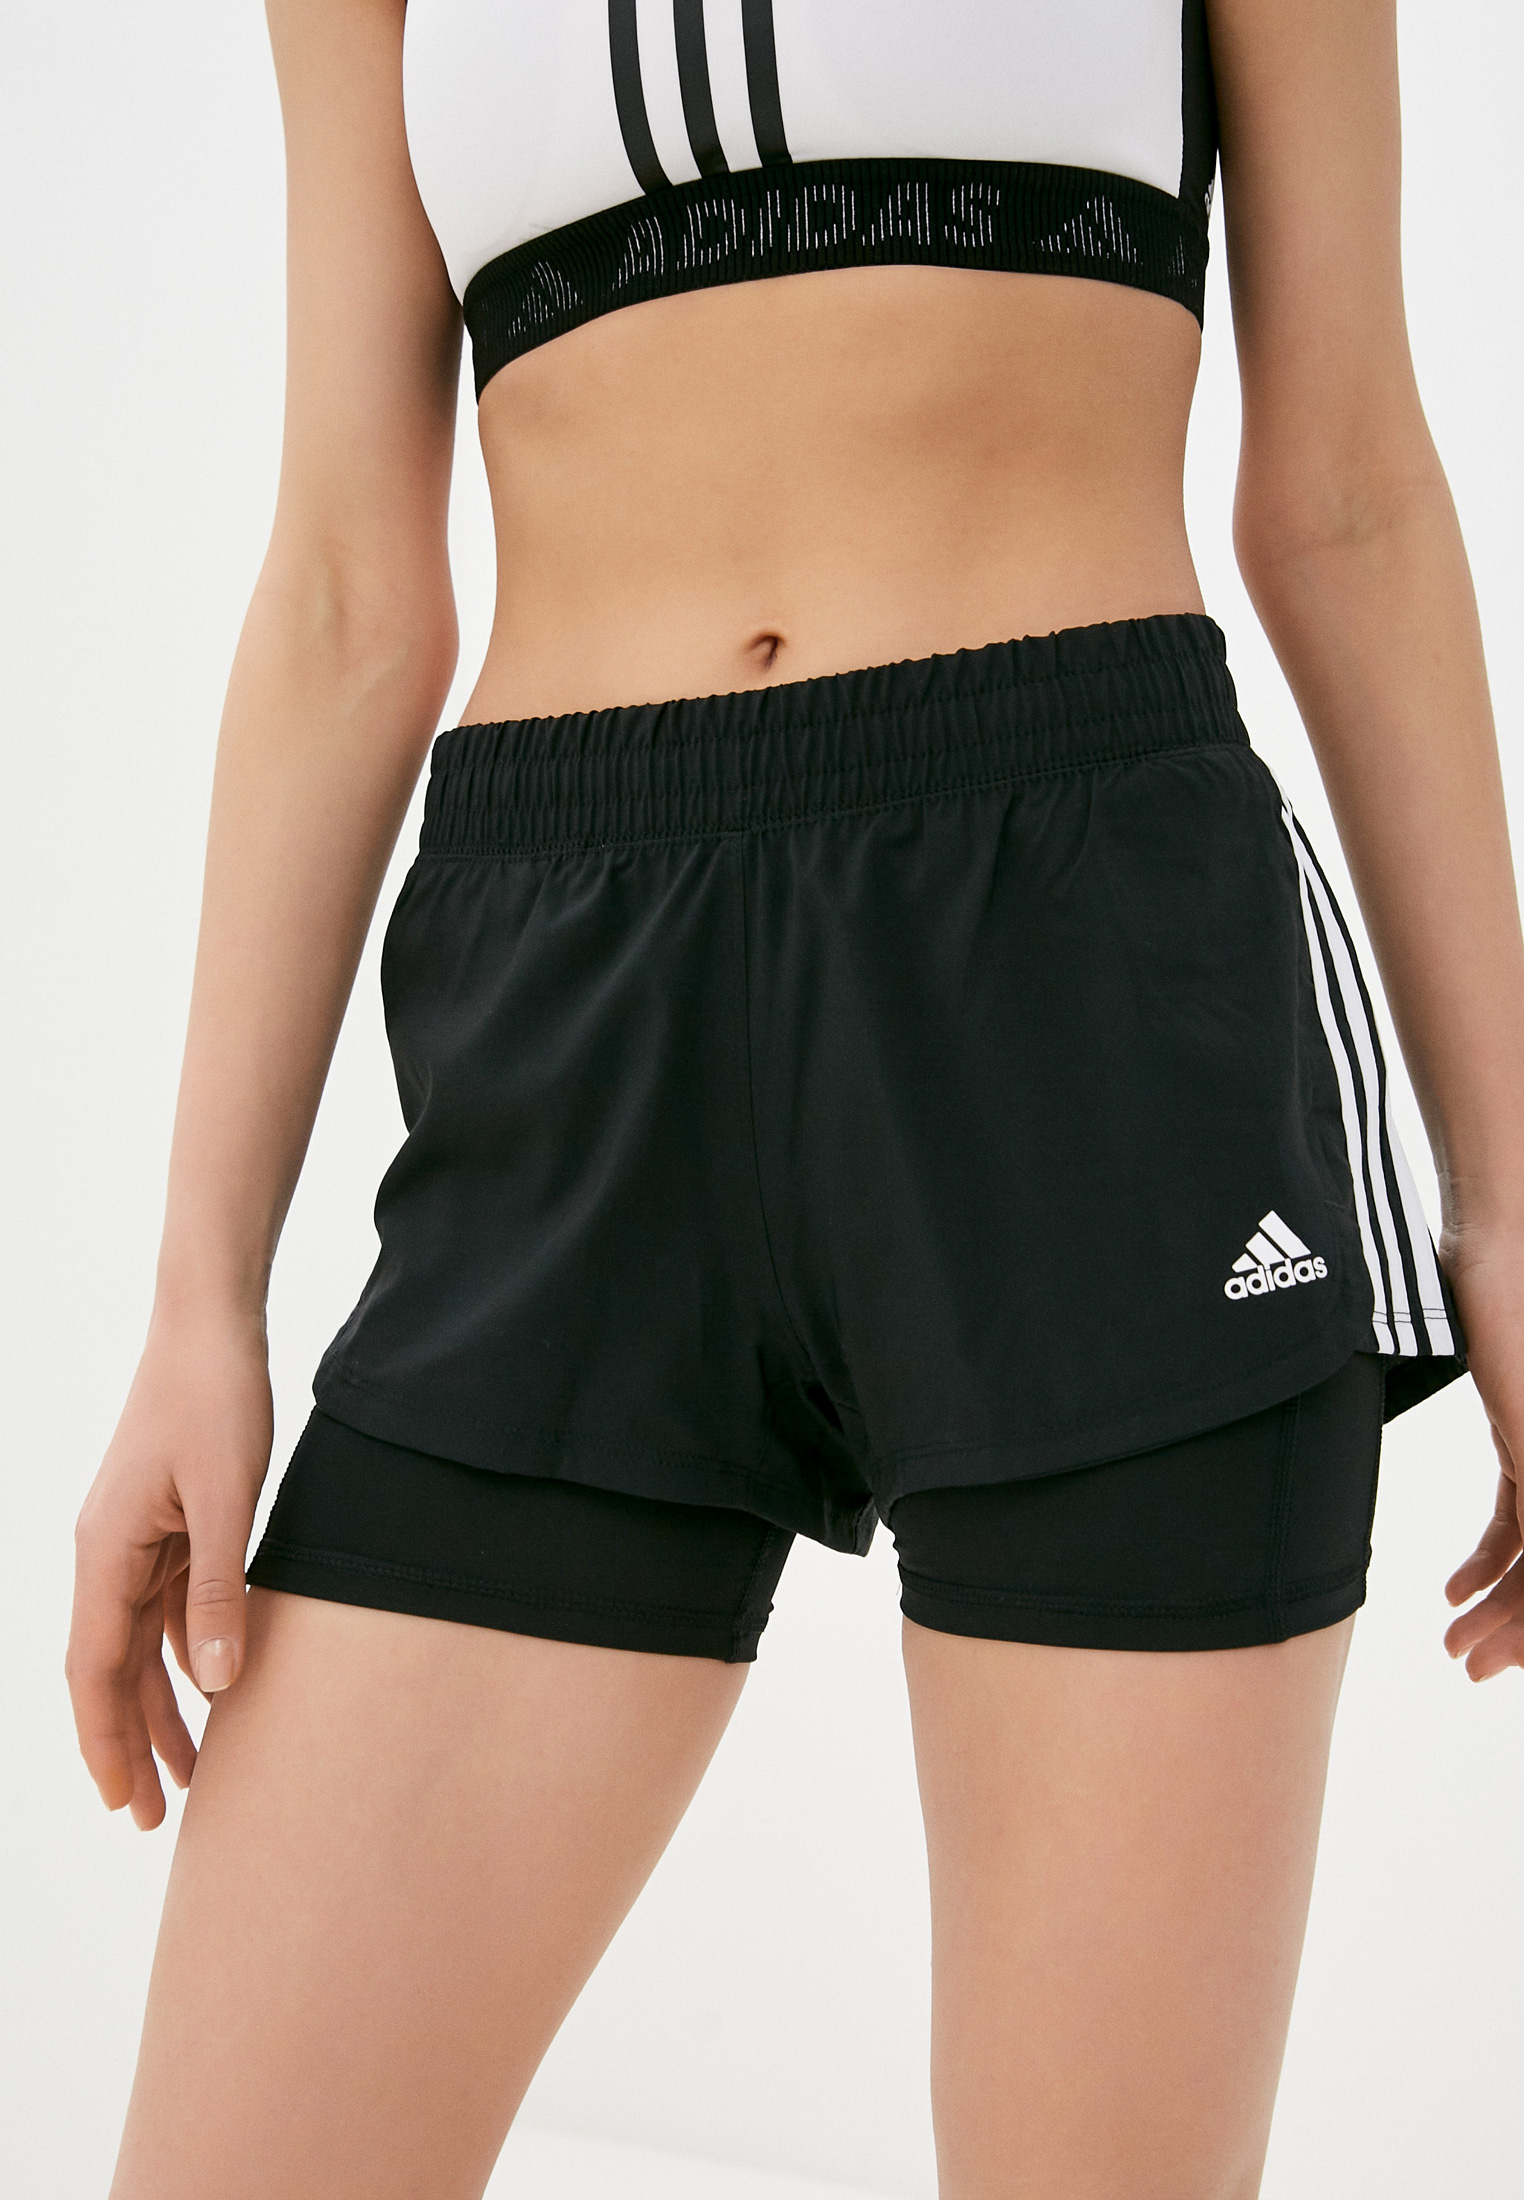 Женские шорты Adidas (Адидас) Шорты Pacer 3S 2 In 1 adidas